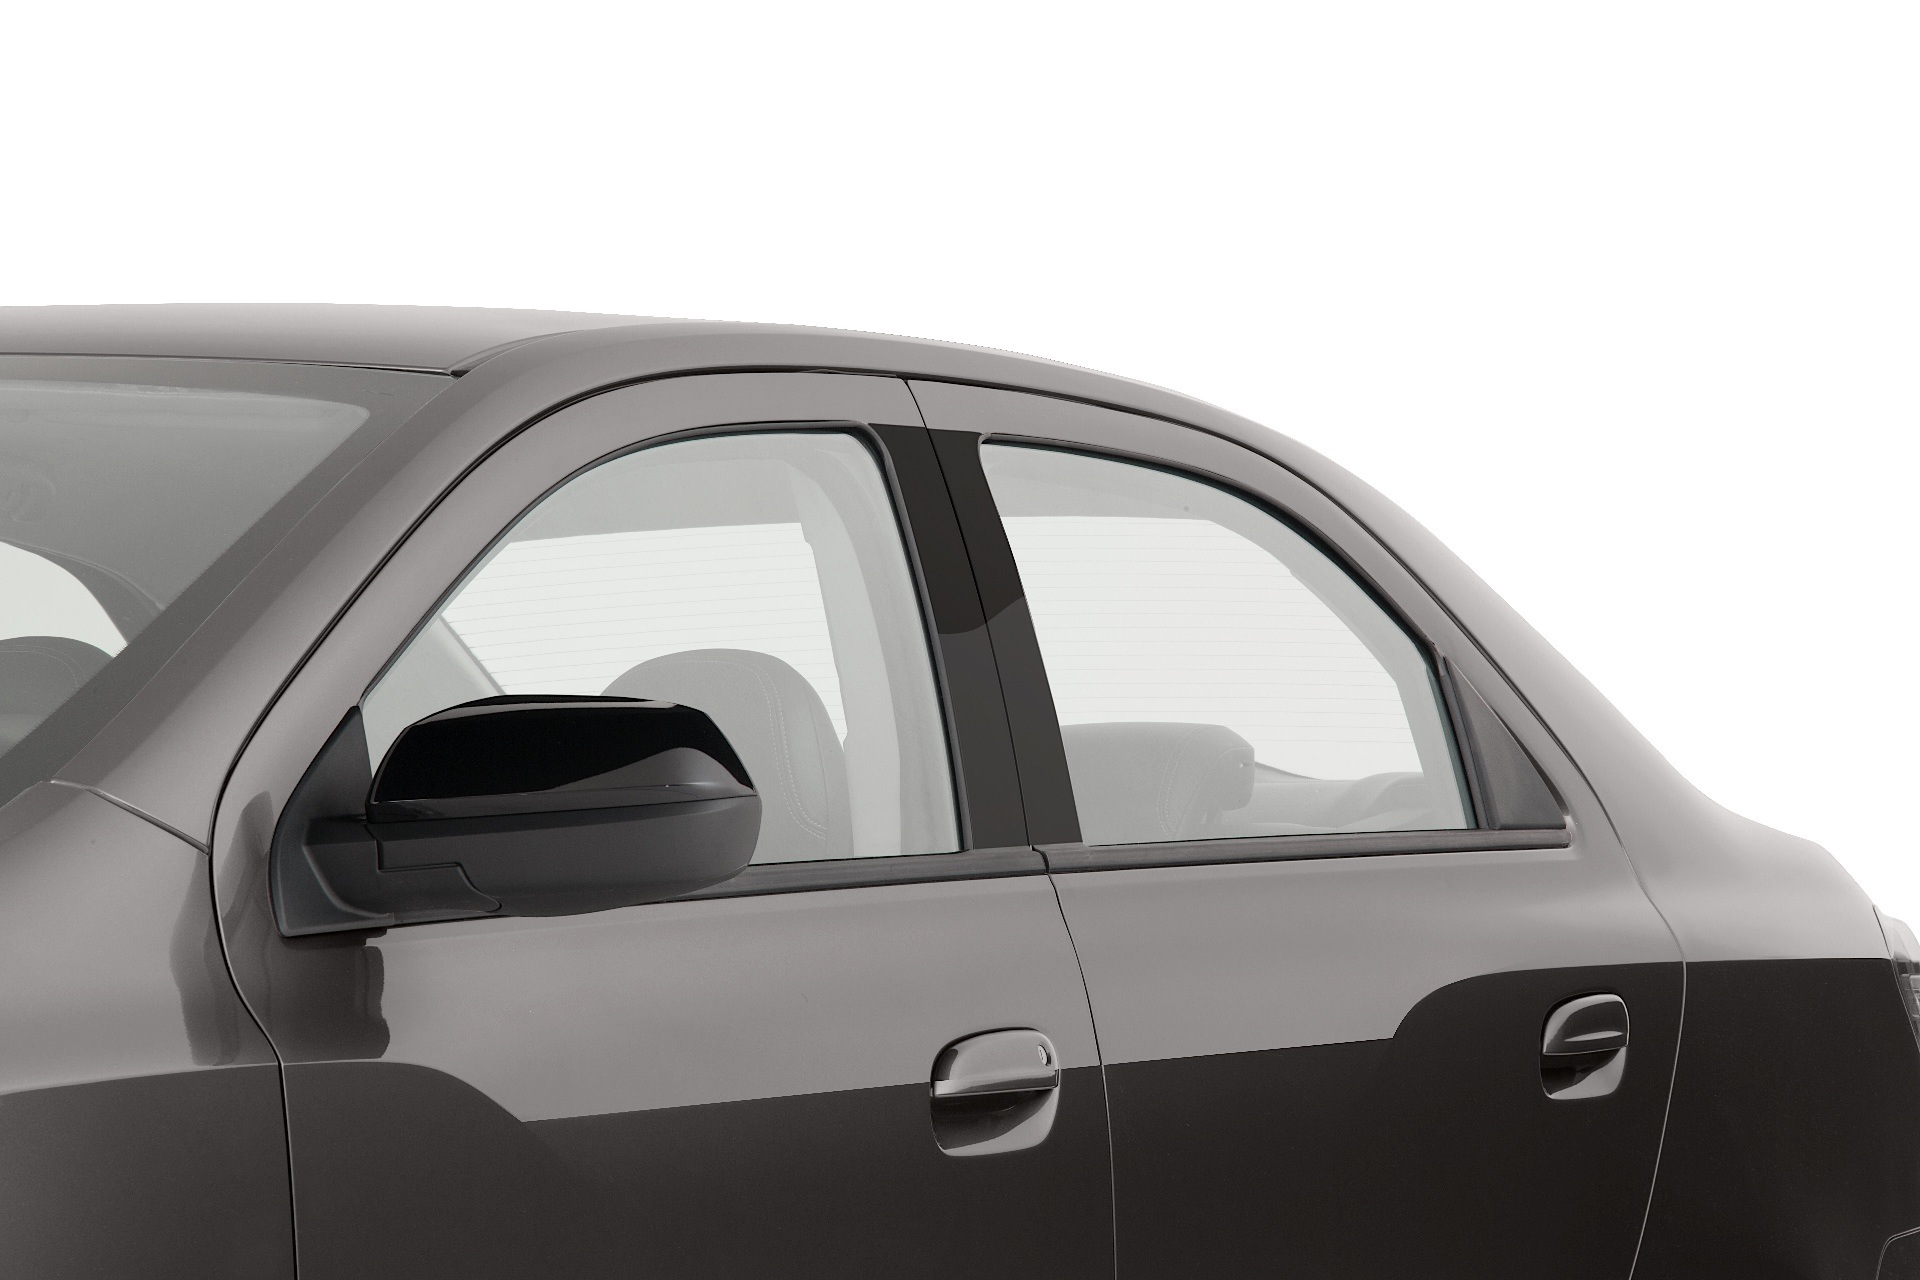 Chevrolet Cobalt Specs Amp Photos 2011 2012 2013 2014